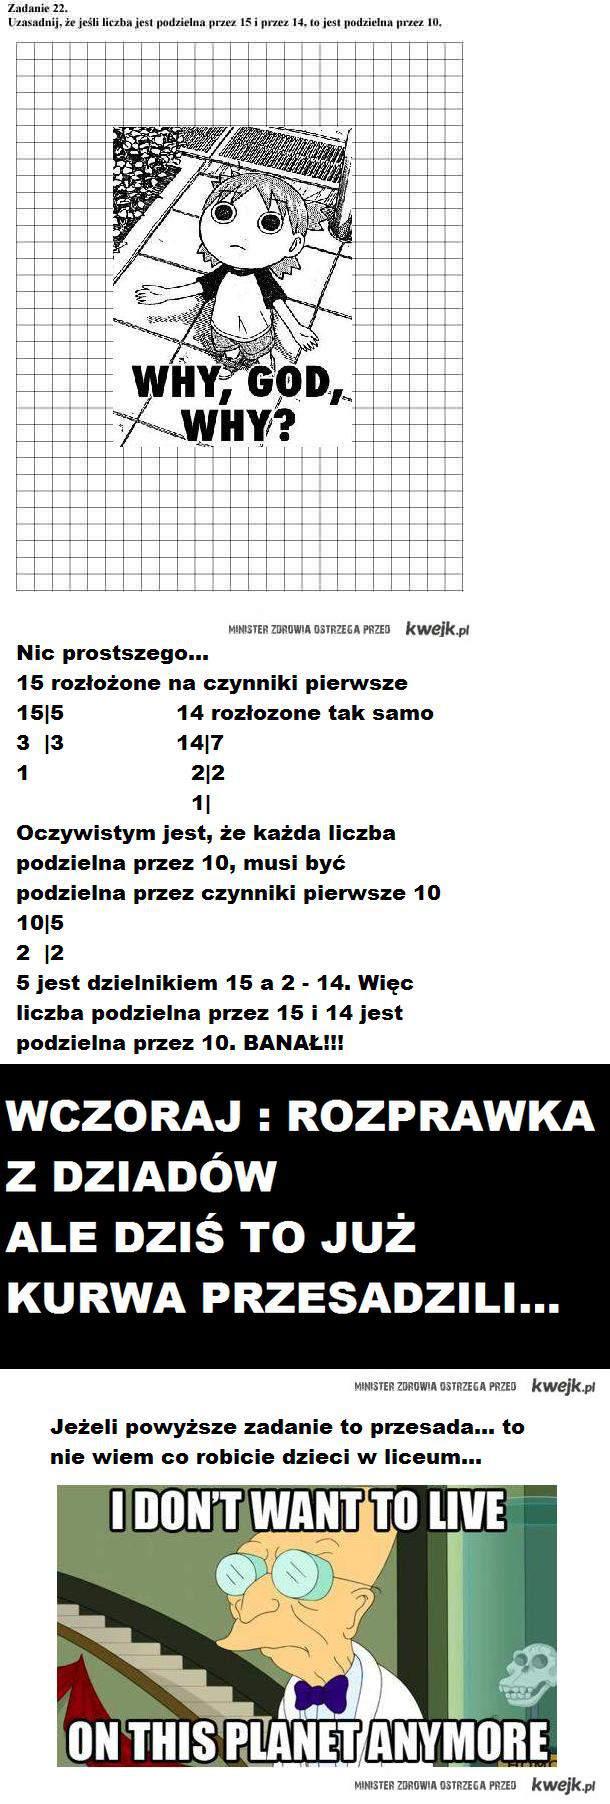 Polscy MATURZYŚCI